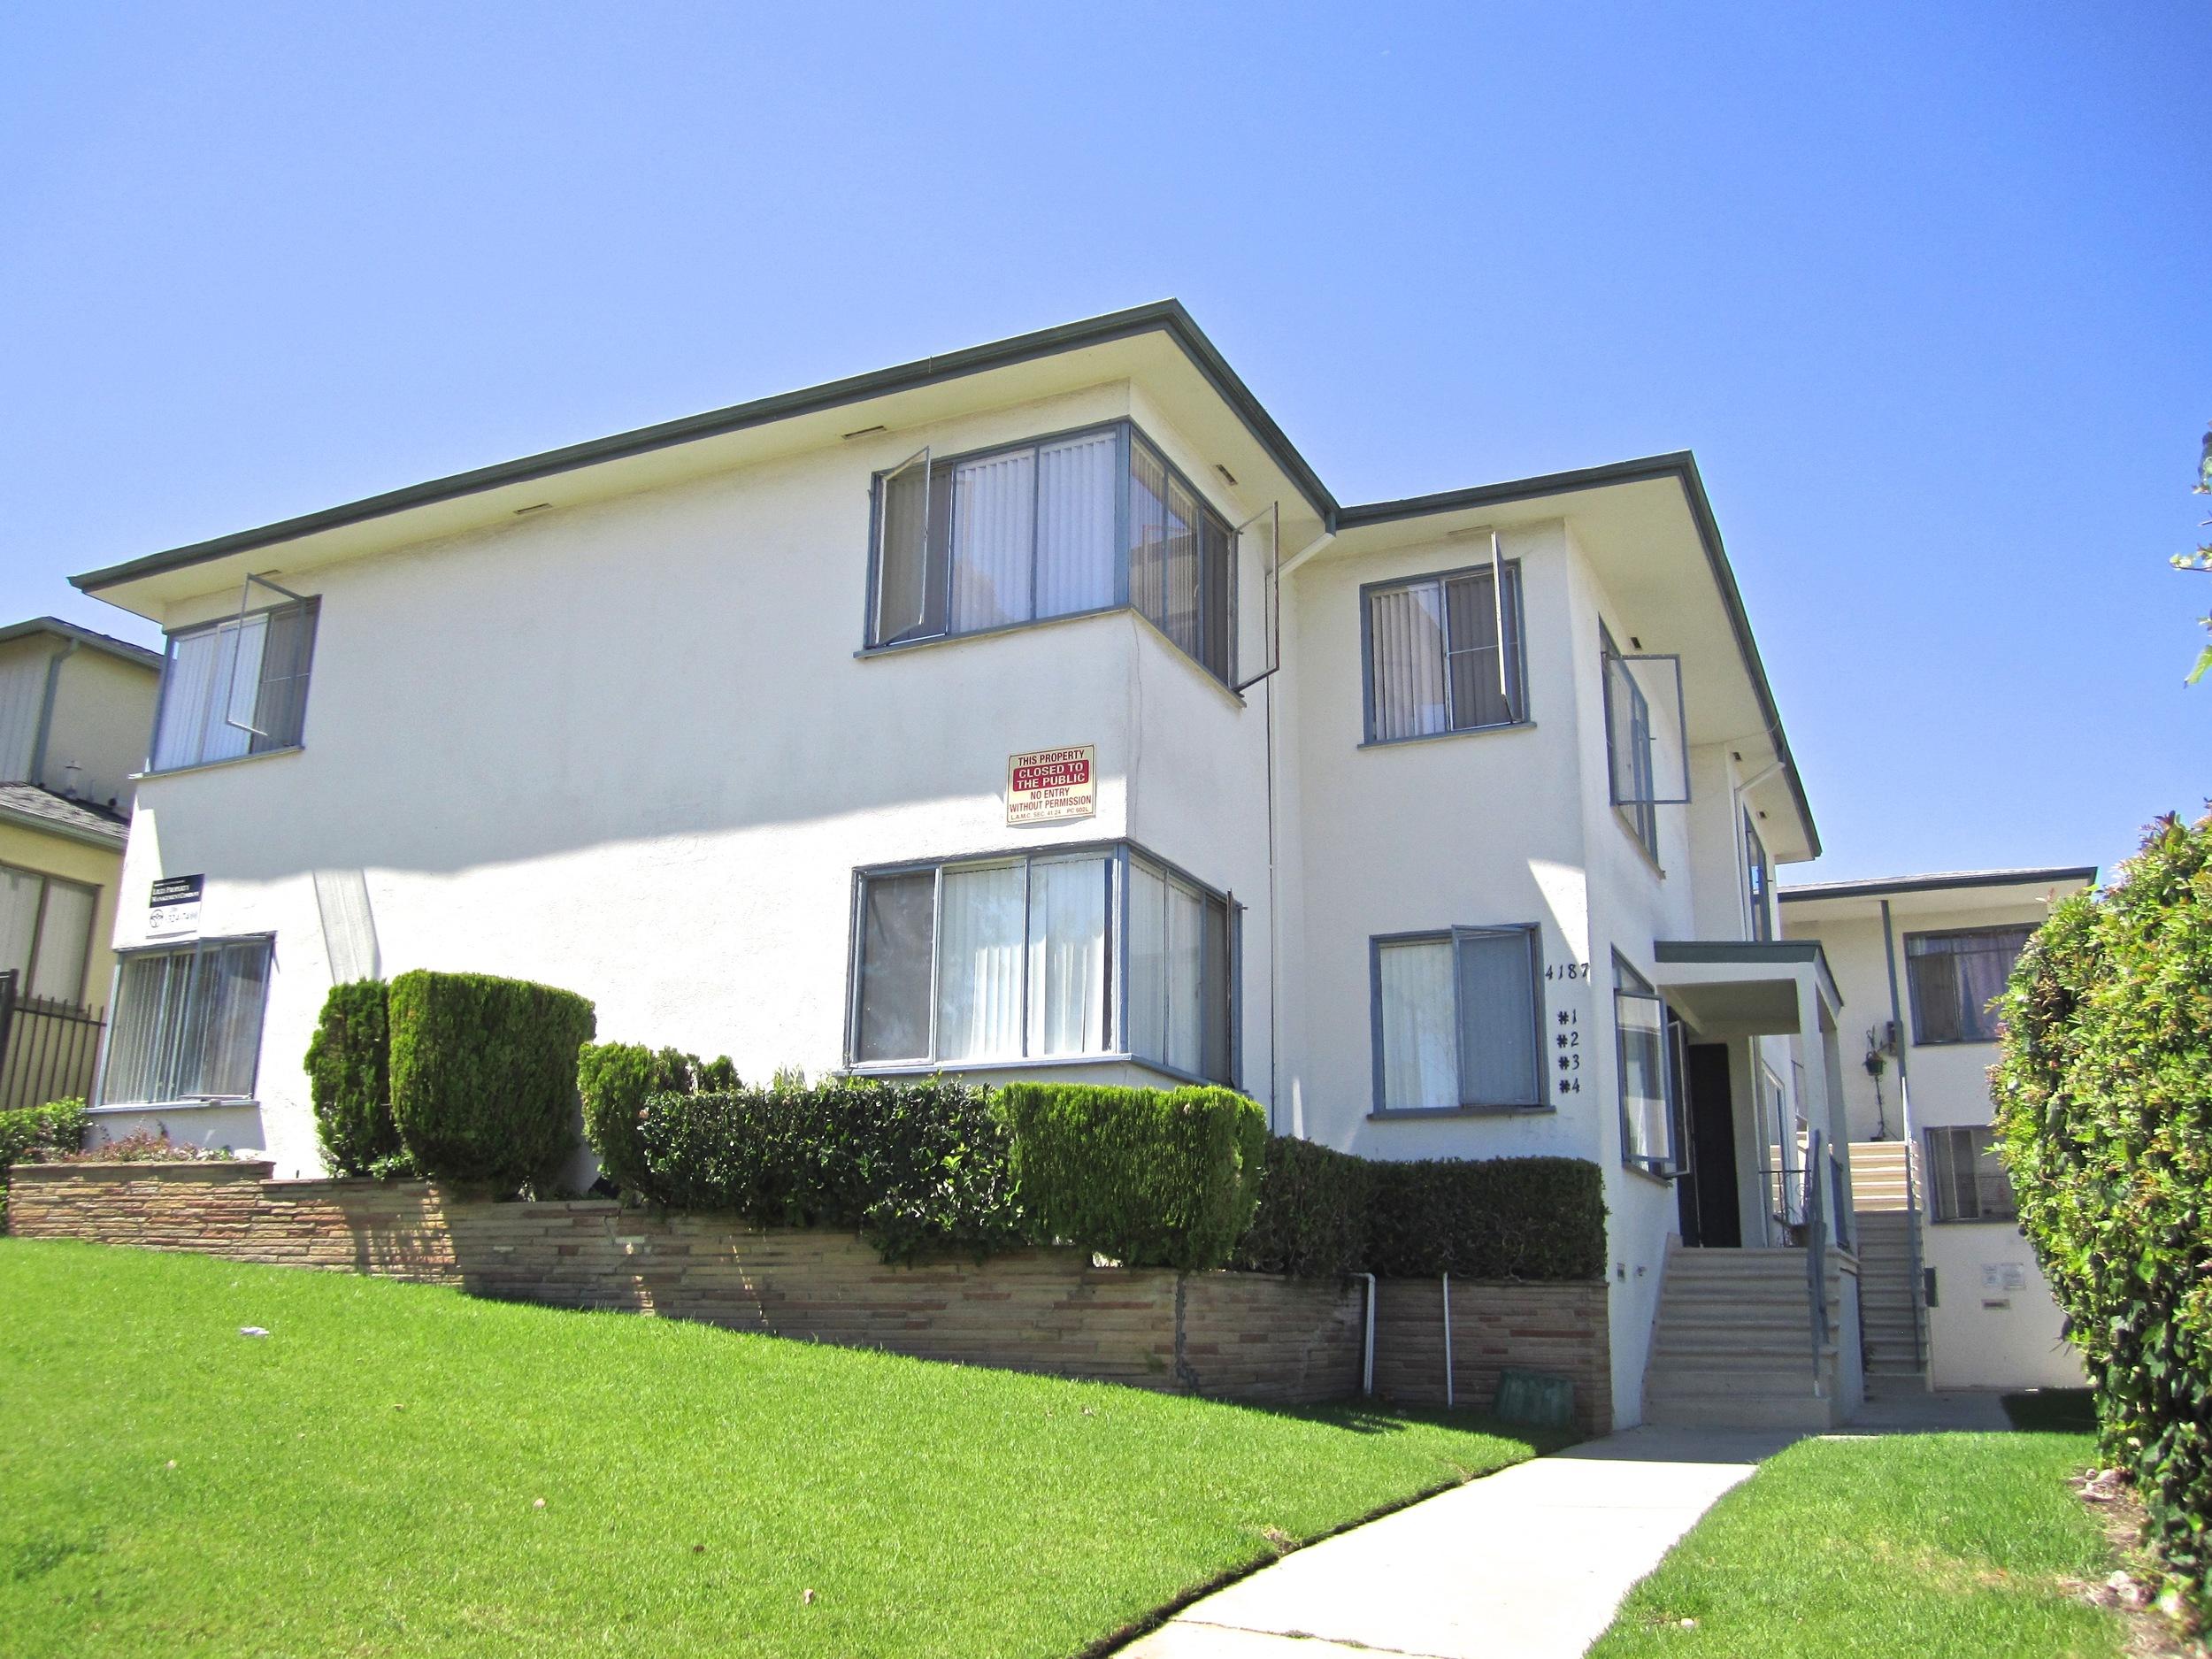 Los Angeles (Baldwin Hills / Crenshaw), CA